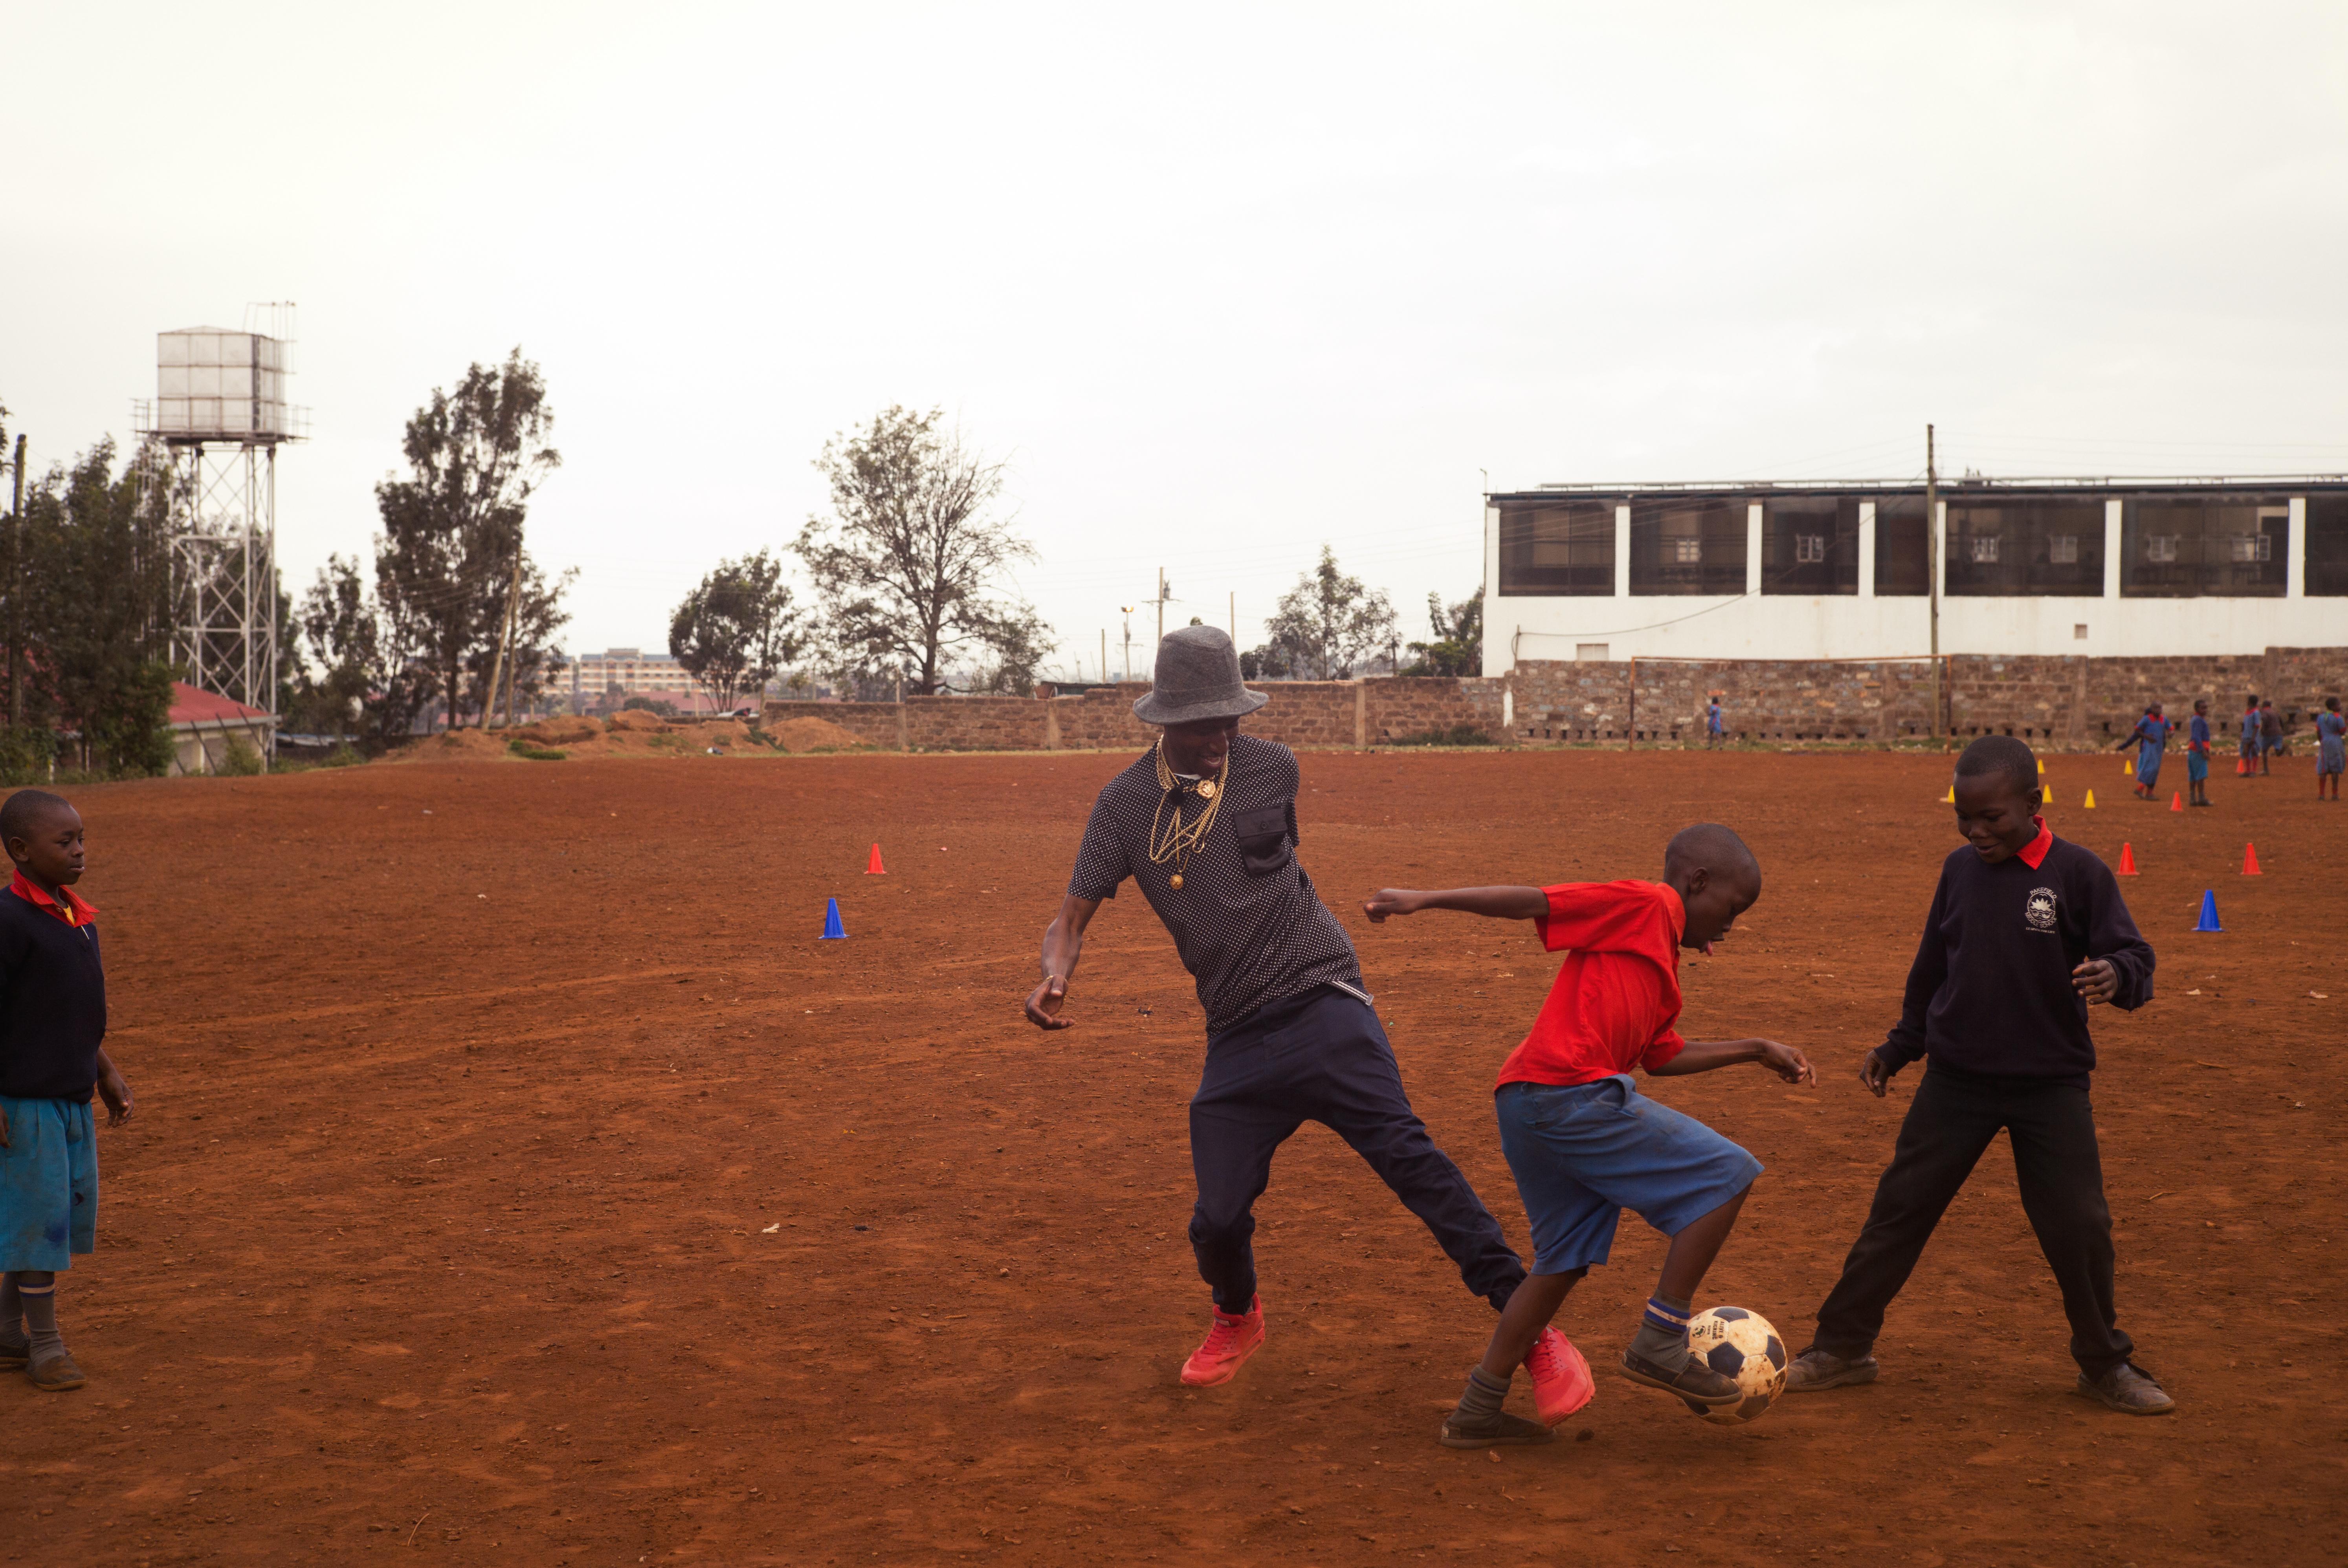 octopizzo_kenia_fussball_2014.jpg